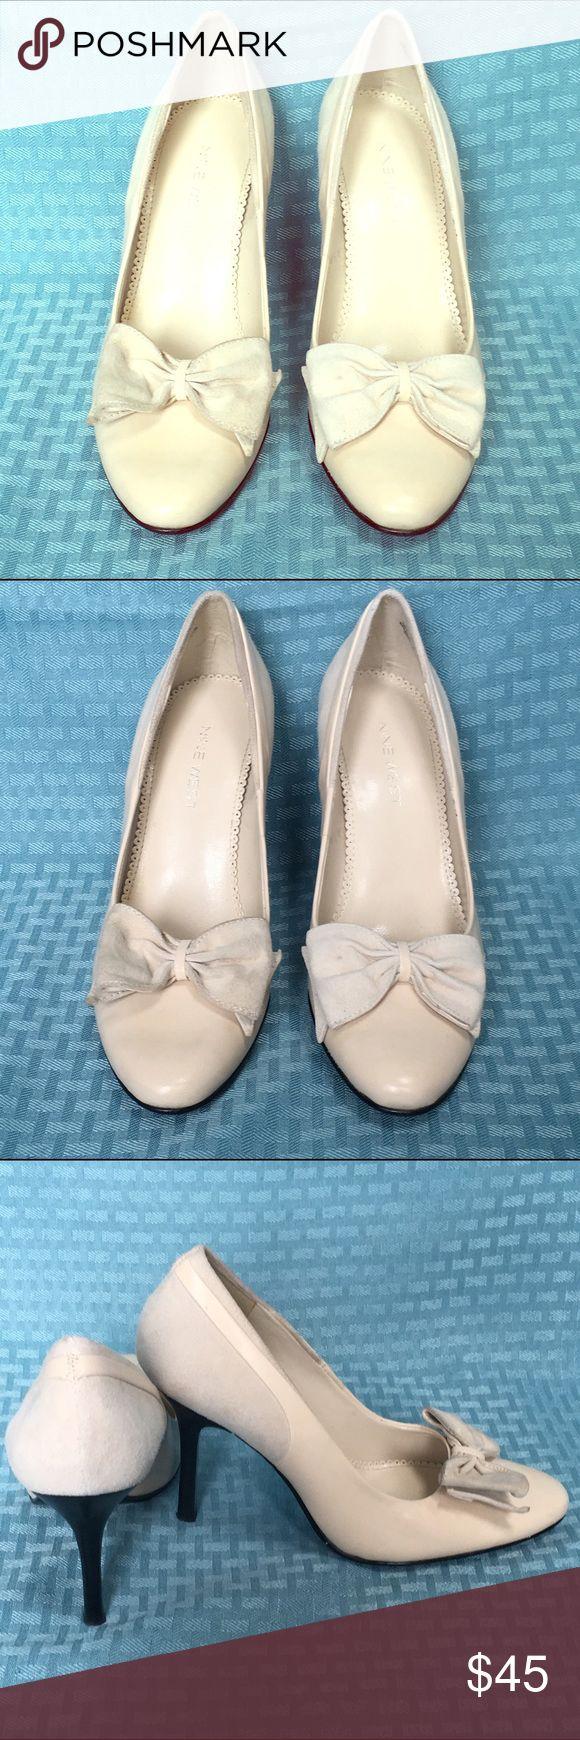 Nine West cream pumps with bow- size 6 Nine West cream pumps- suede and leather with suede bow. Barely worn. Size 6 Nine West Shoes Heels